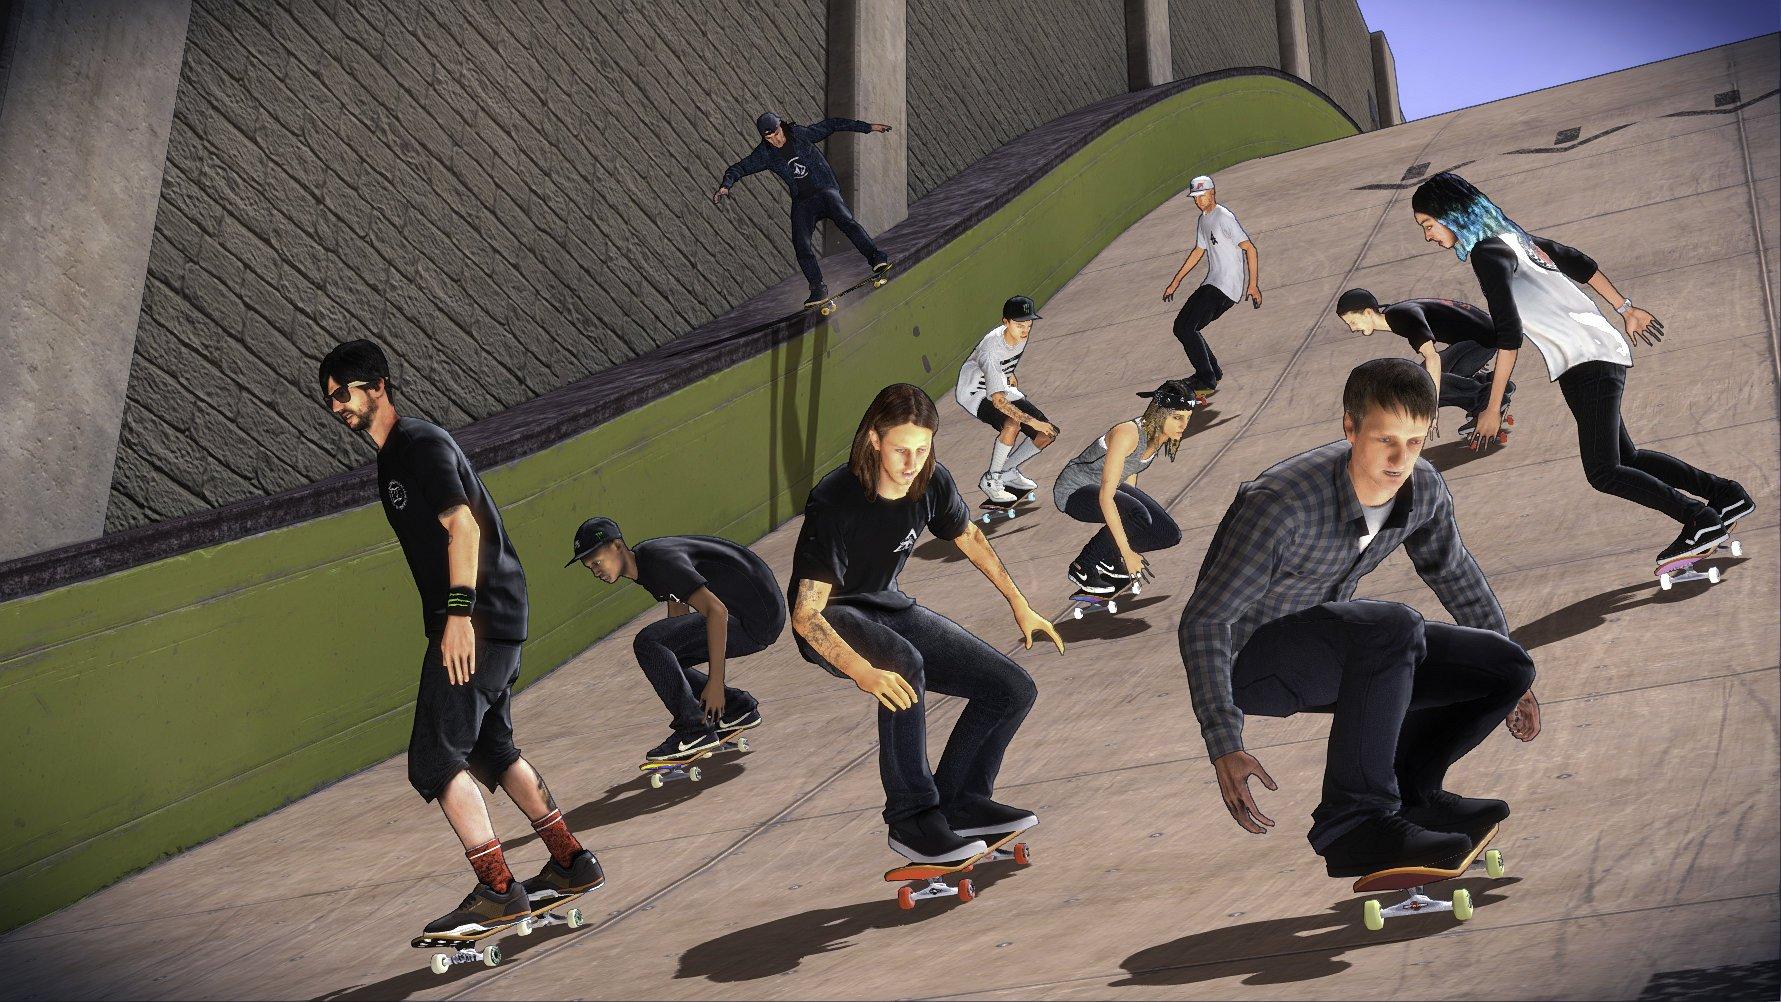 tony_hawk_s_pro_skater_5-3163228.jpg